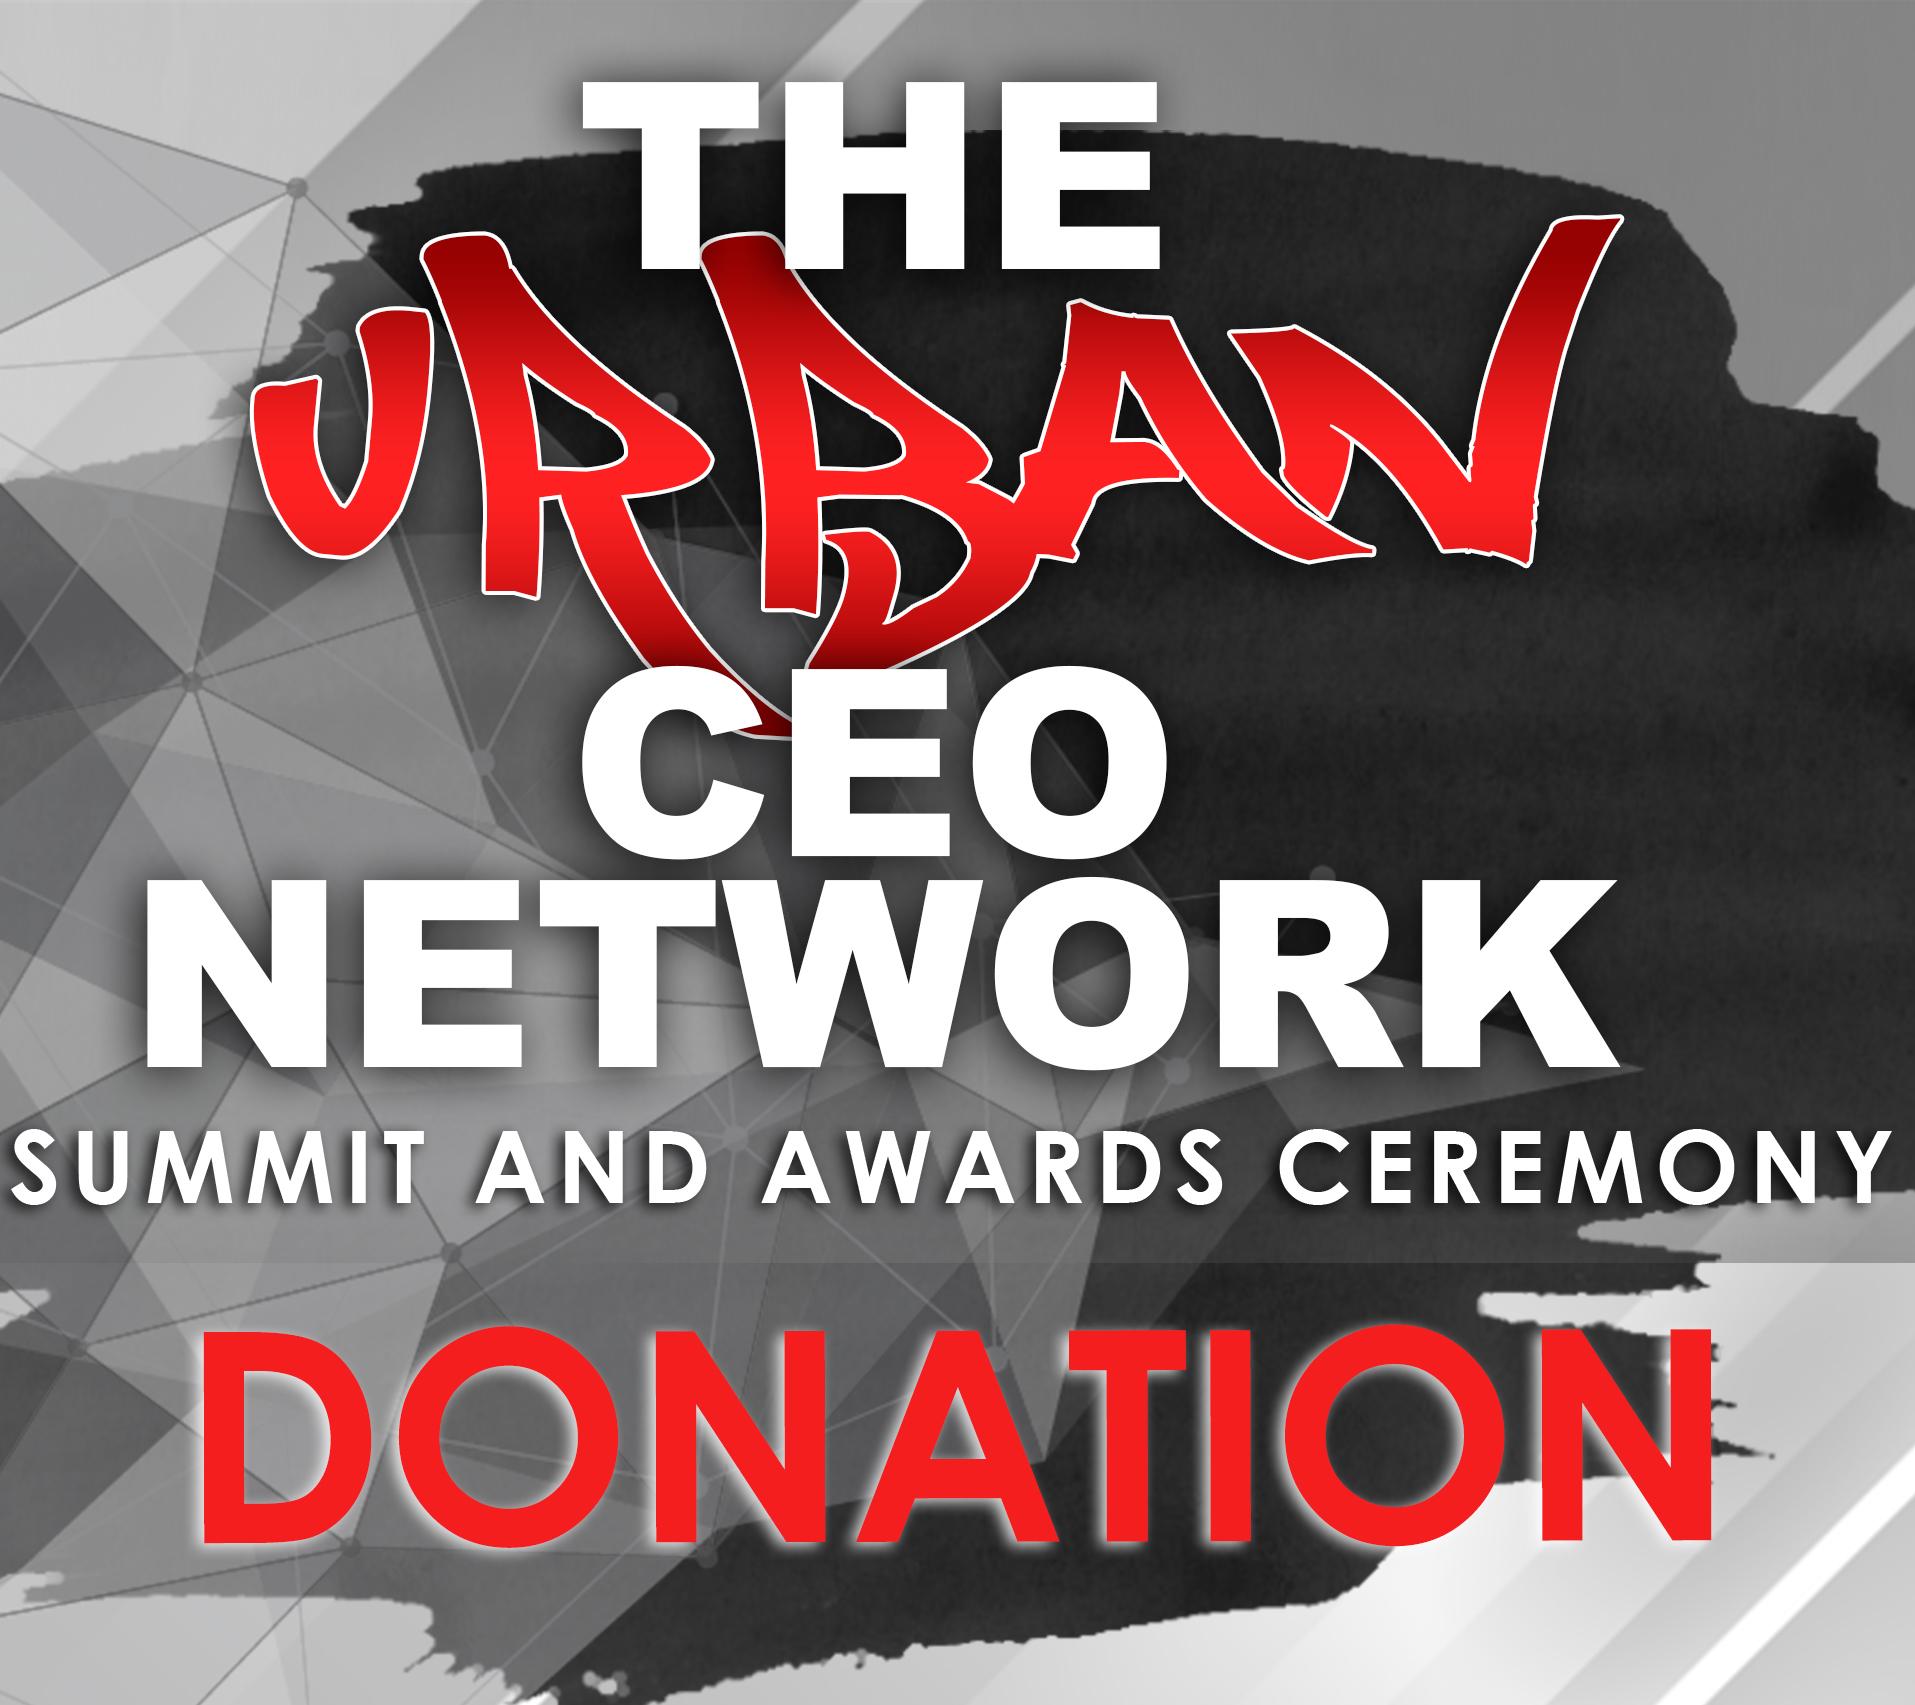 Urban CEO Summit Donation 00010